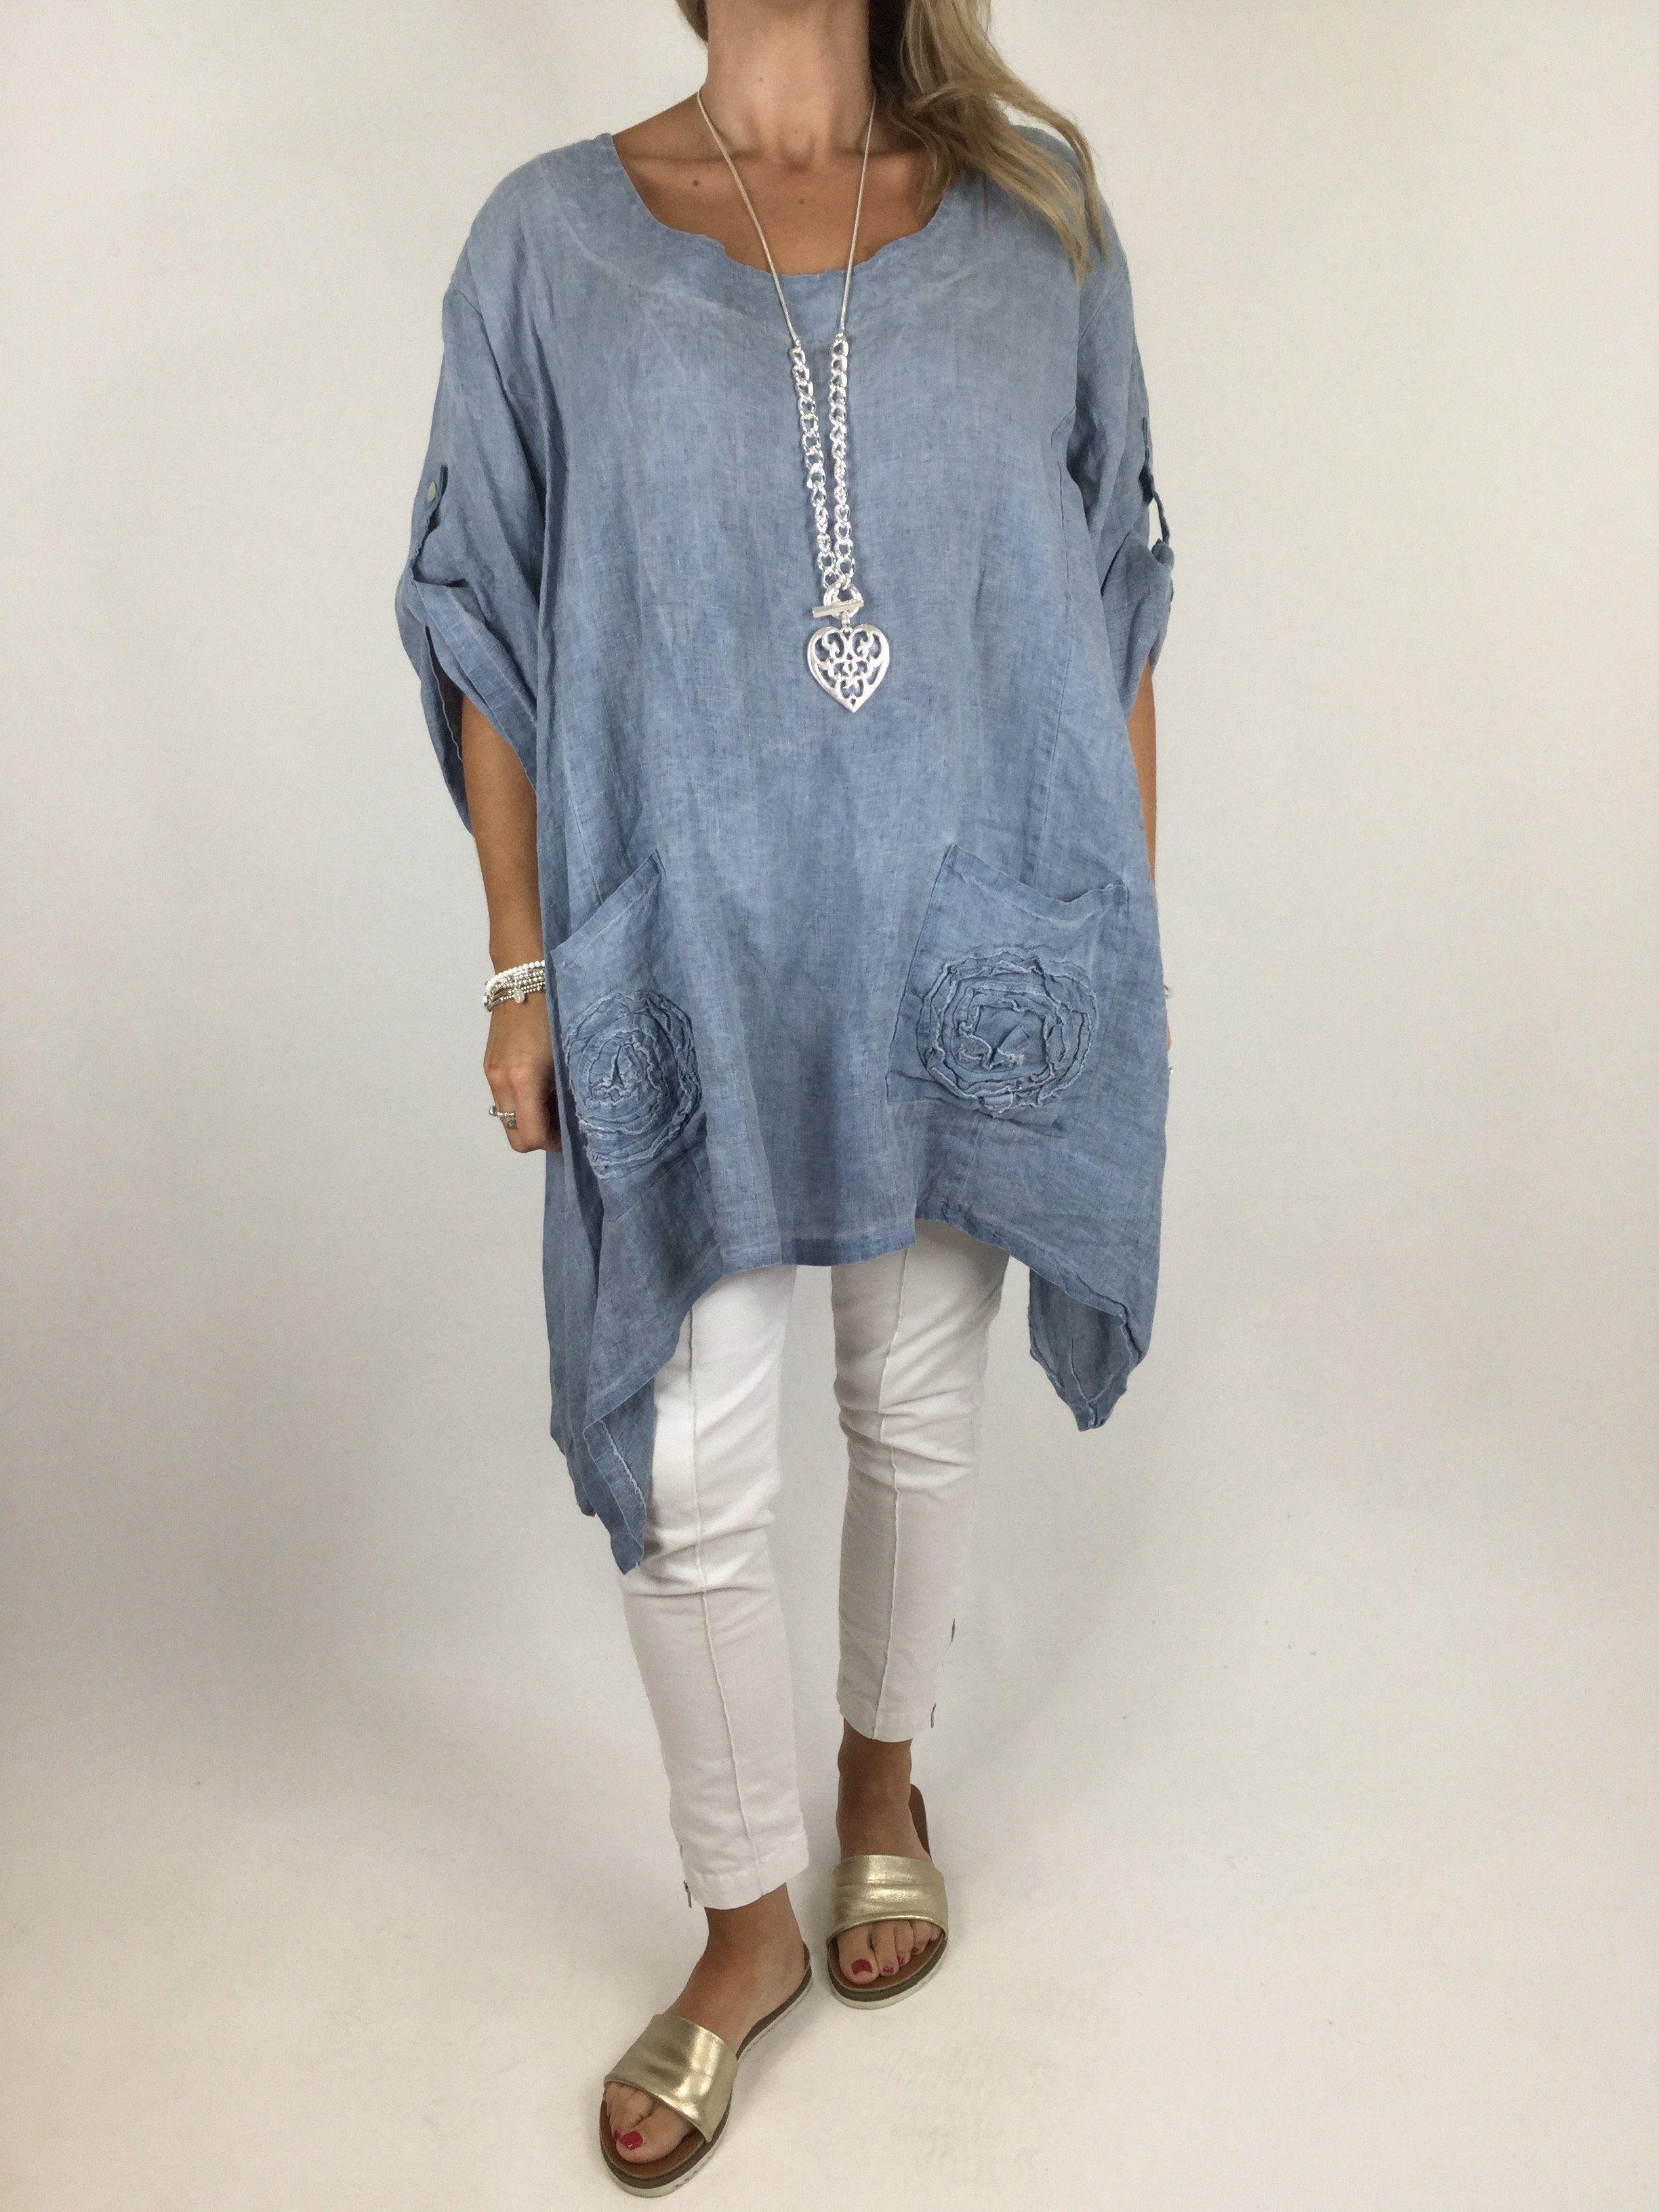 New Womens Italian Lagenlook Oversized 4 Button Detail Linen Plus Size Tunic Top